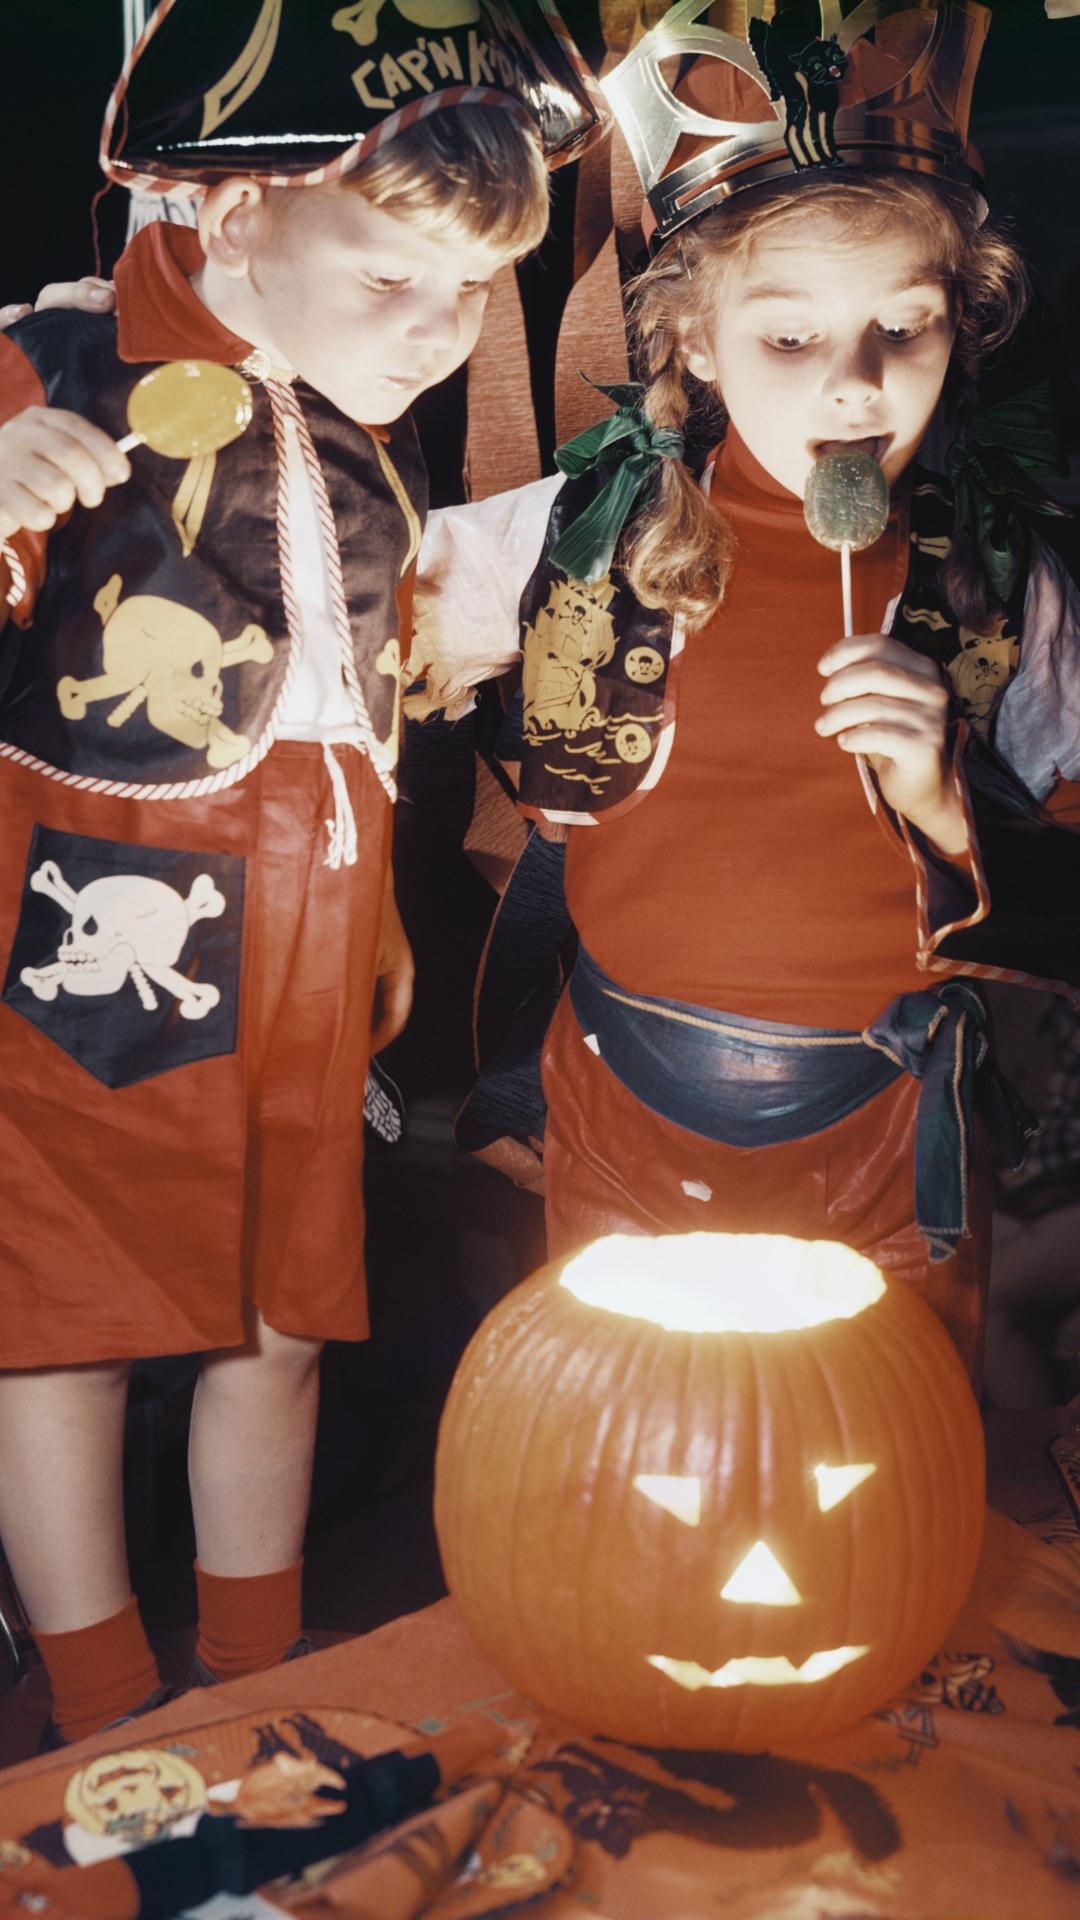 Children looking into glowing jack-o-lantern